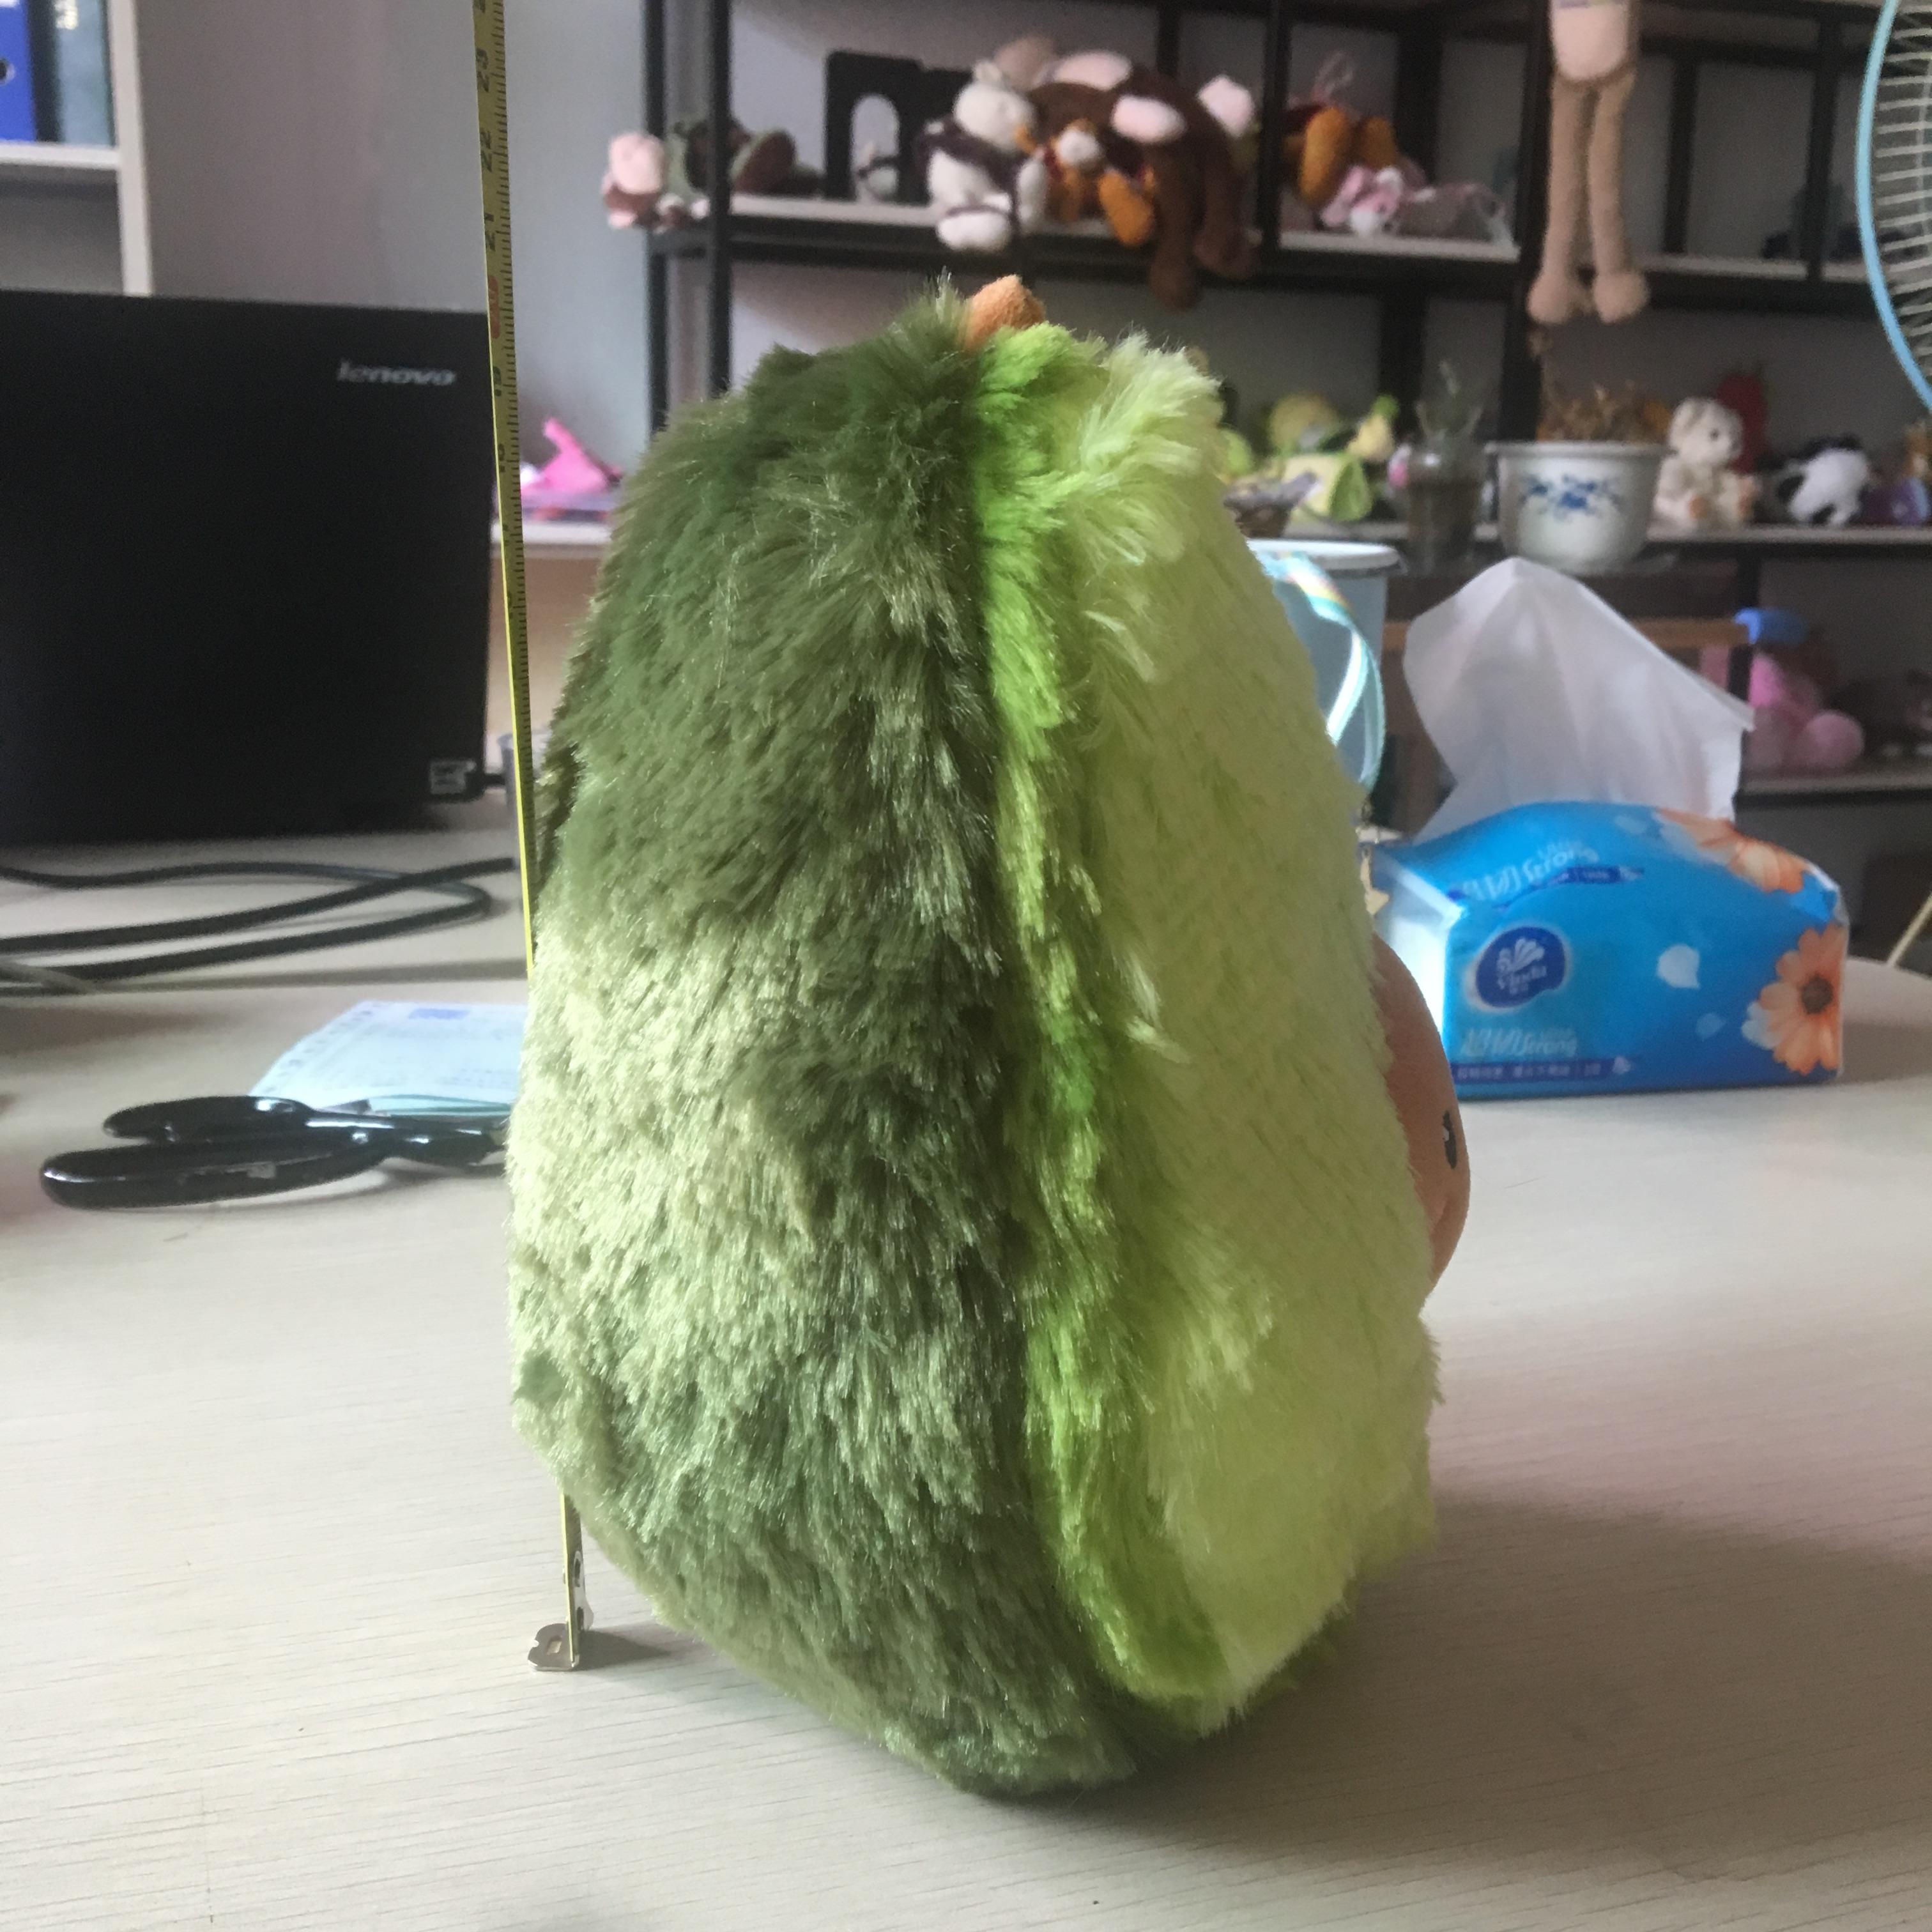 Fashion Plush Toy New Design Outlet Hot Sale On Amazon Best Quality Plush Toy Avocado